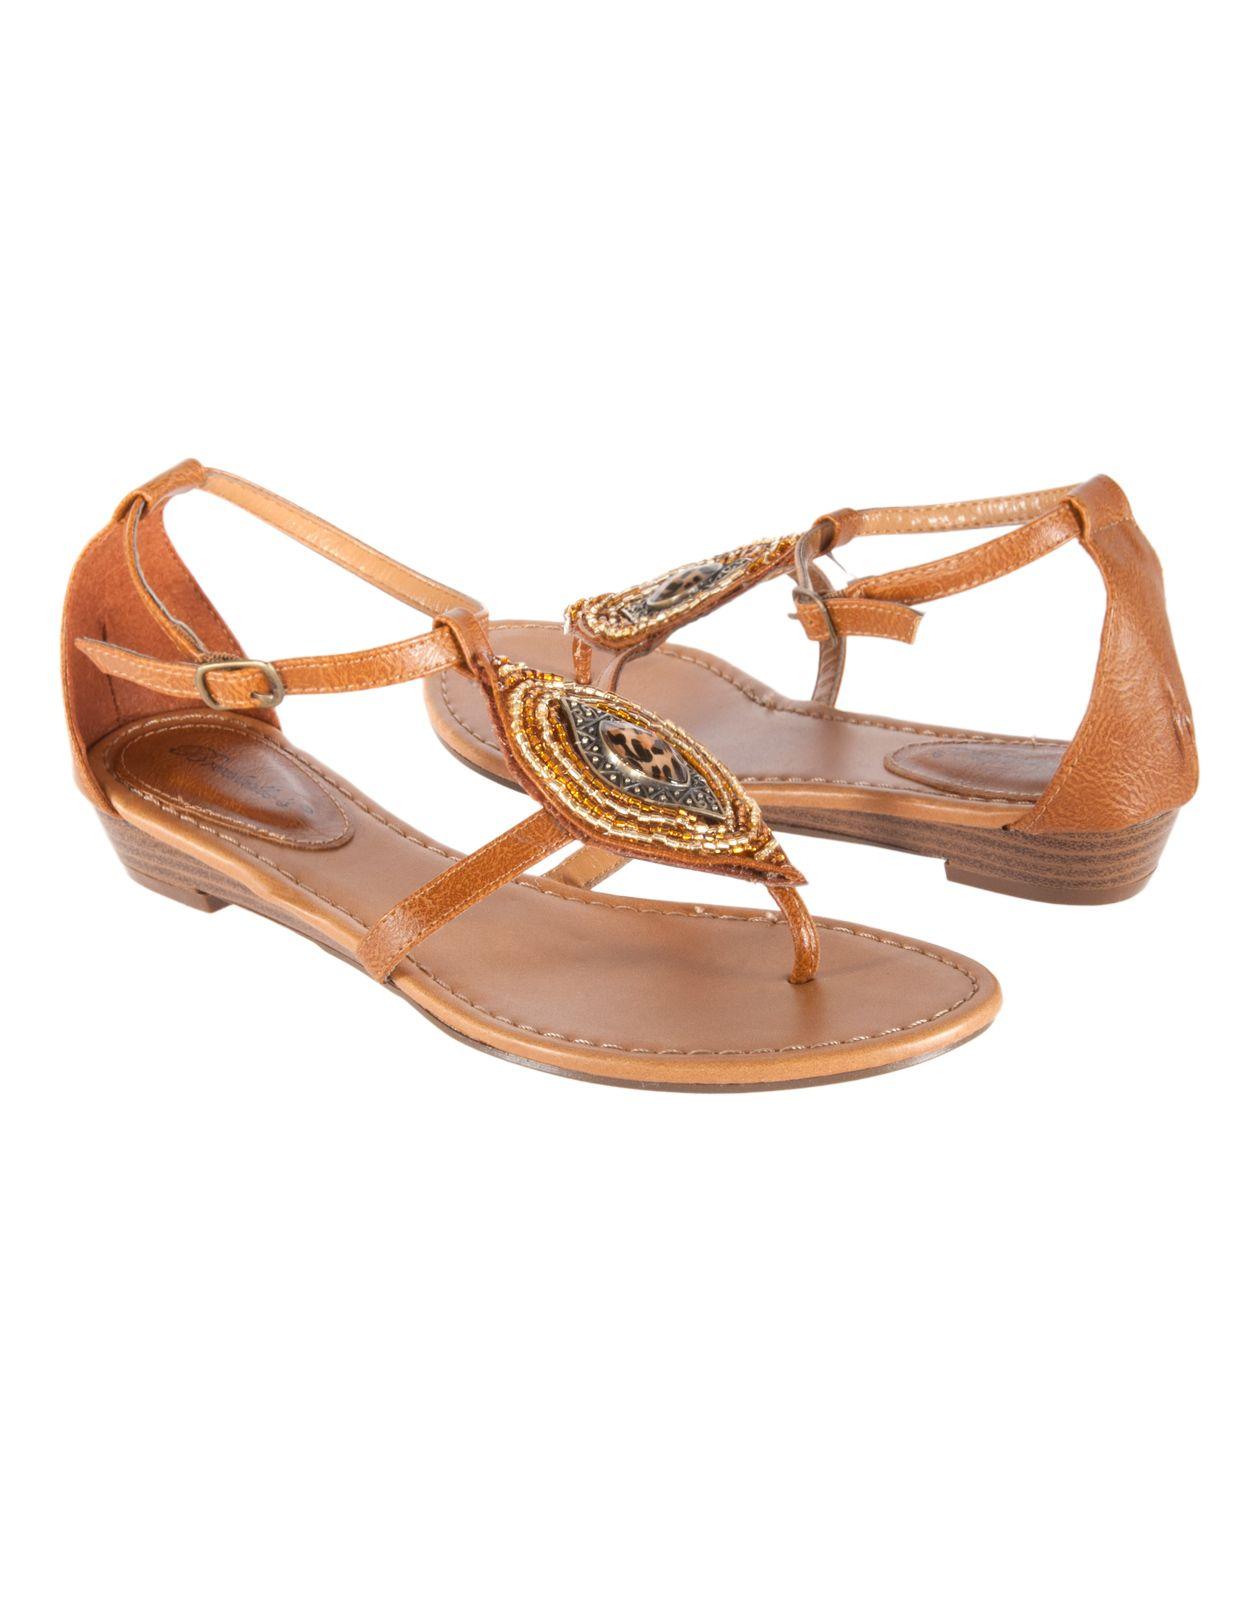 Honeysuckle Stone Gladiator Sandal < Sexy Shoes